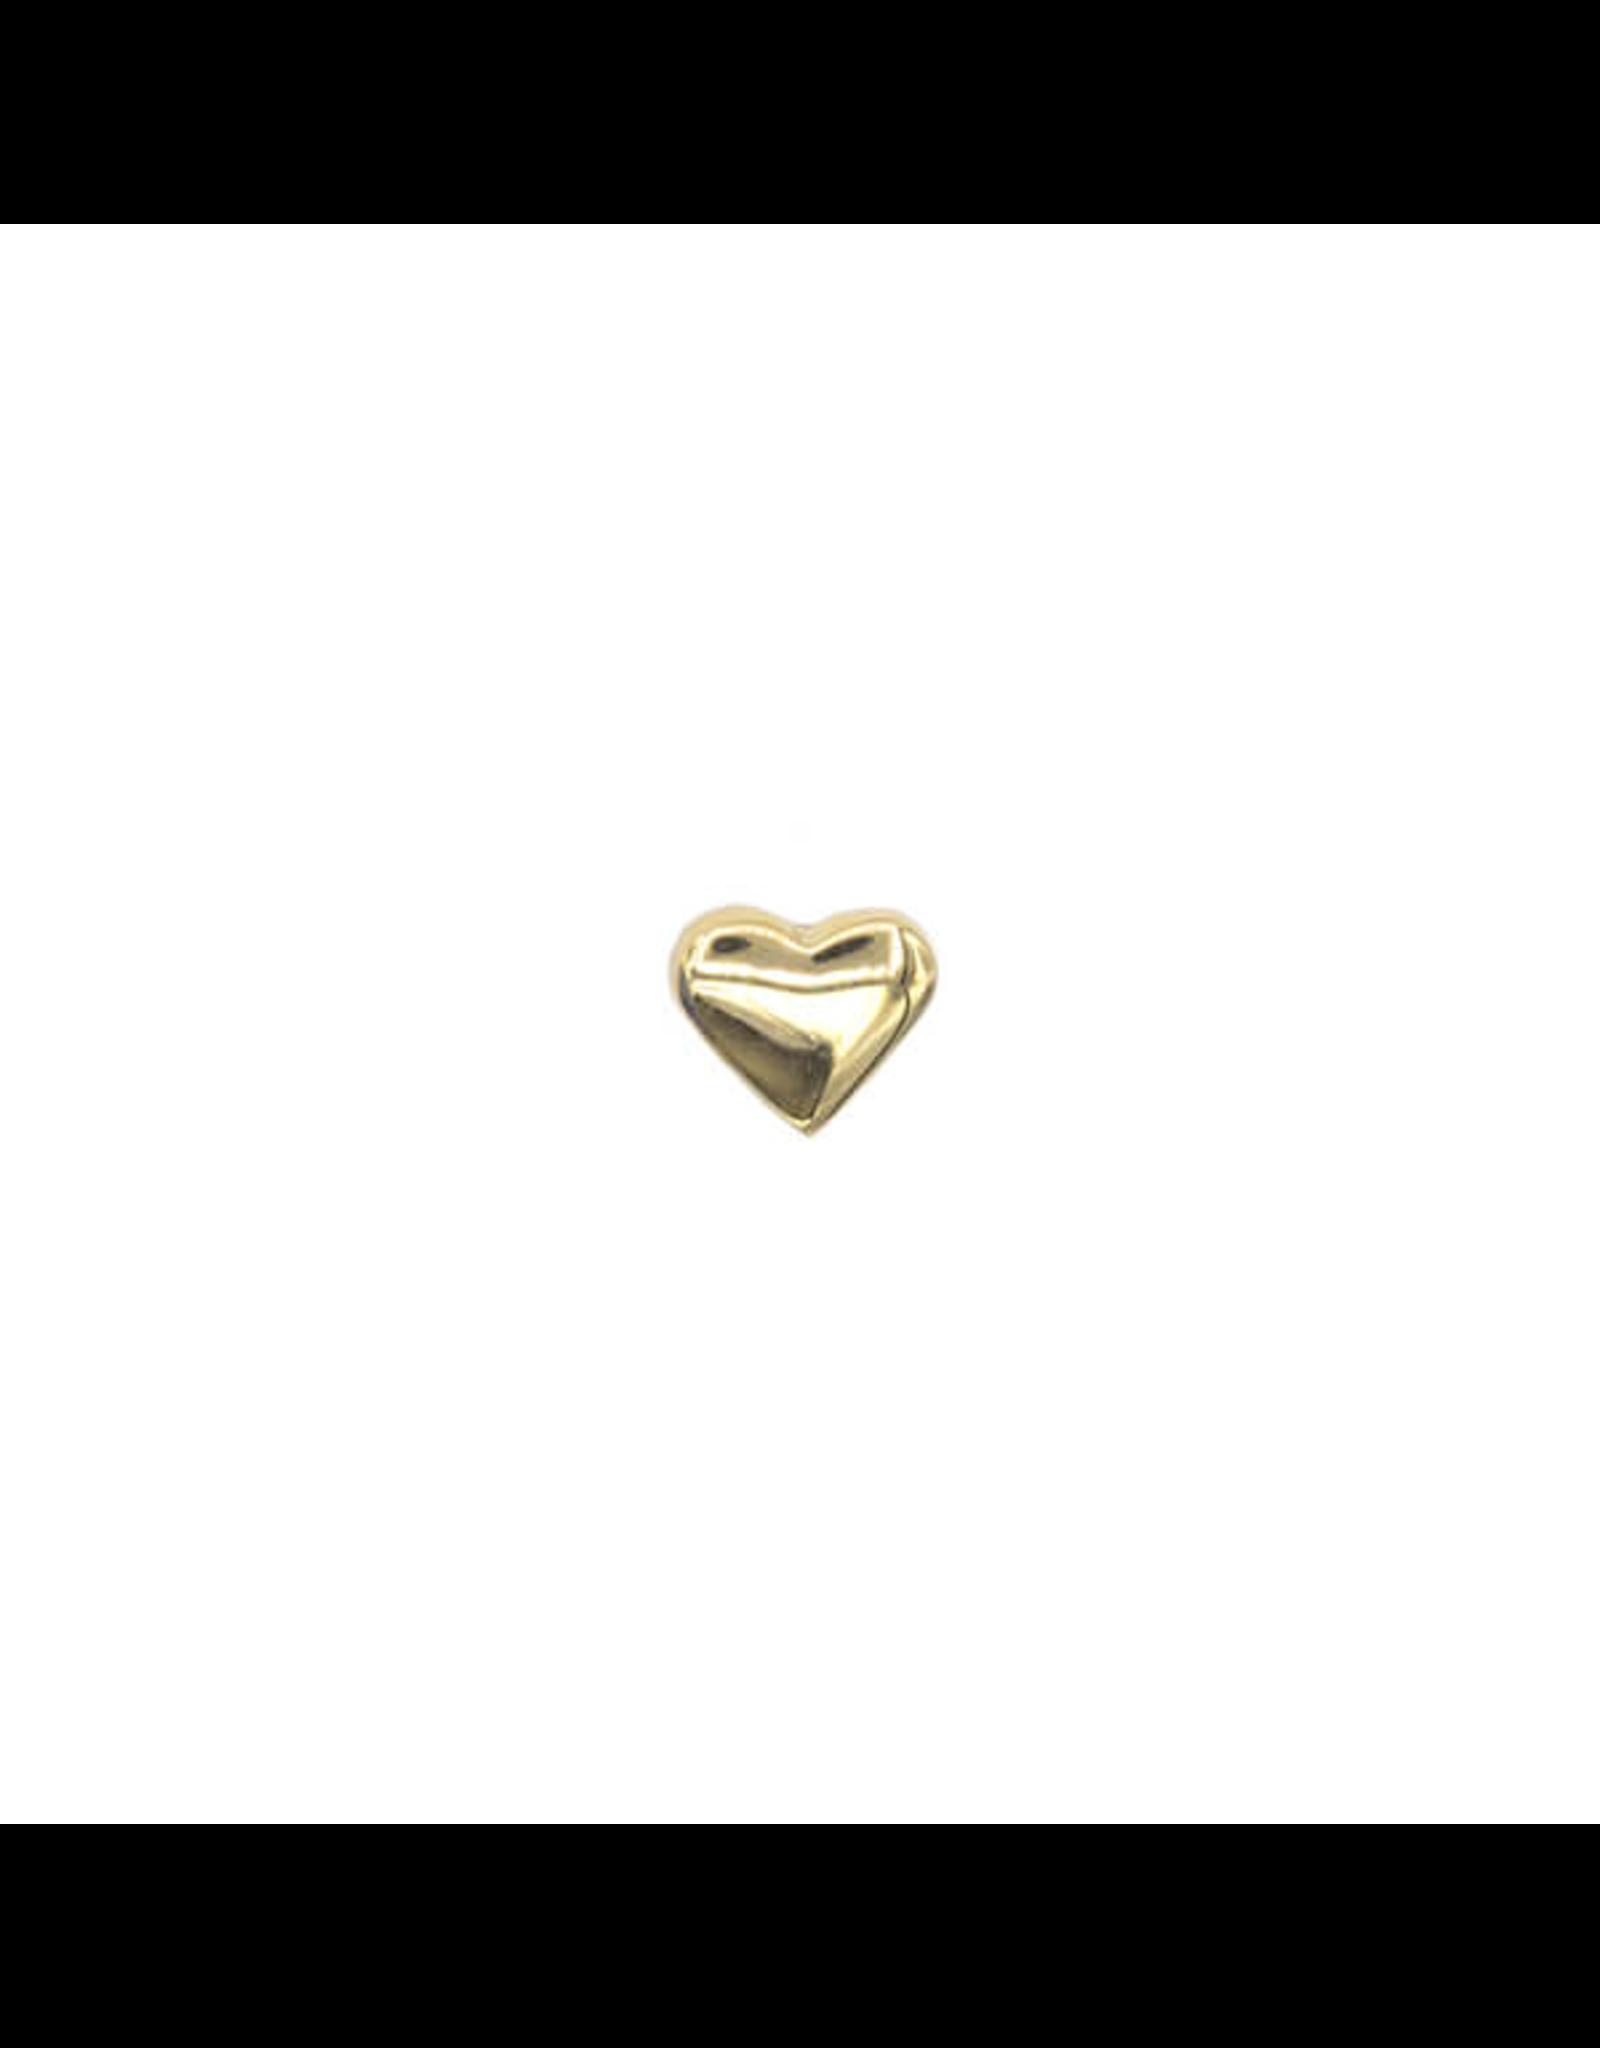 14k YG Plain Heart (1.5mm) Threadless Pin